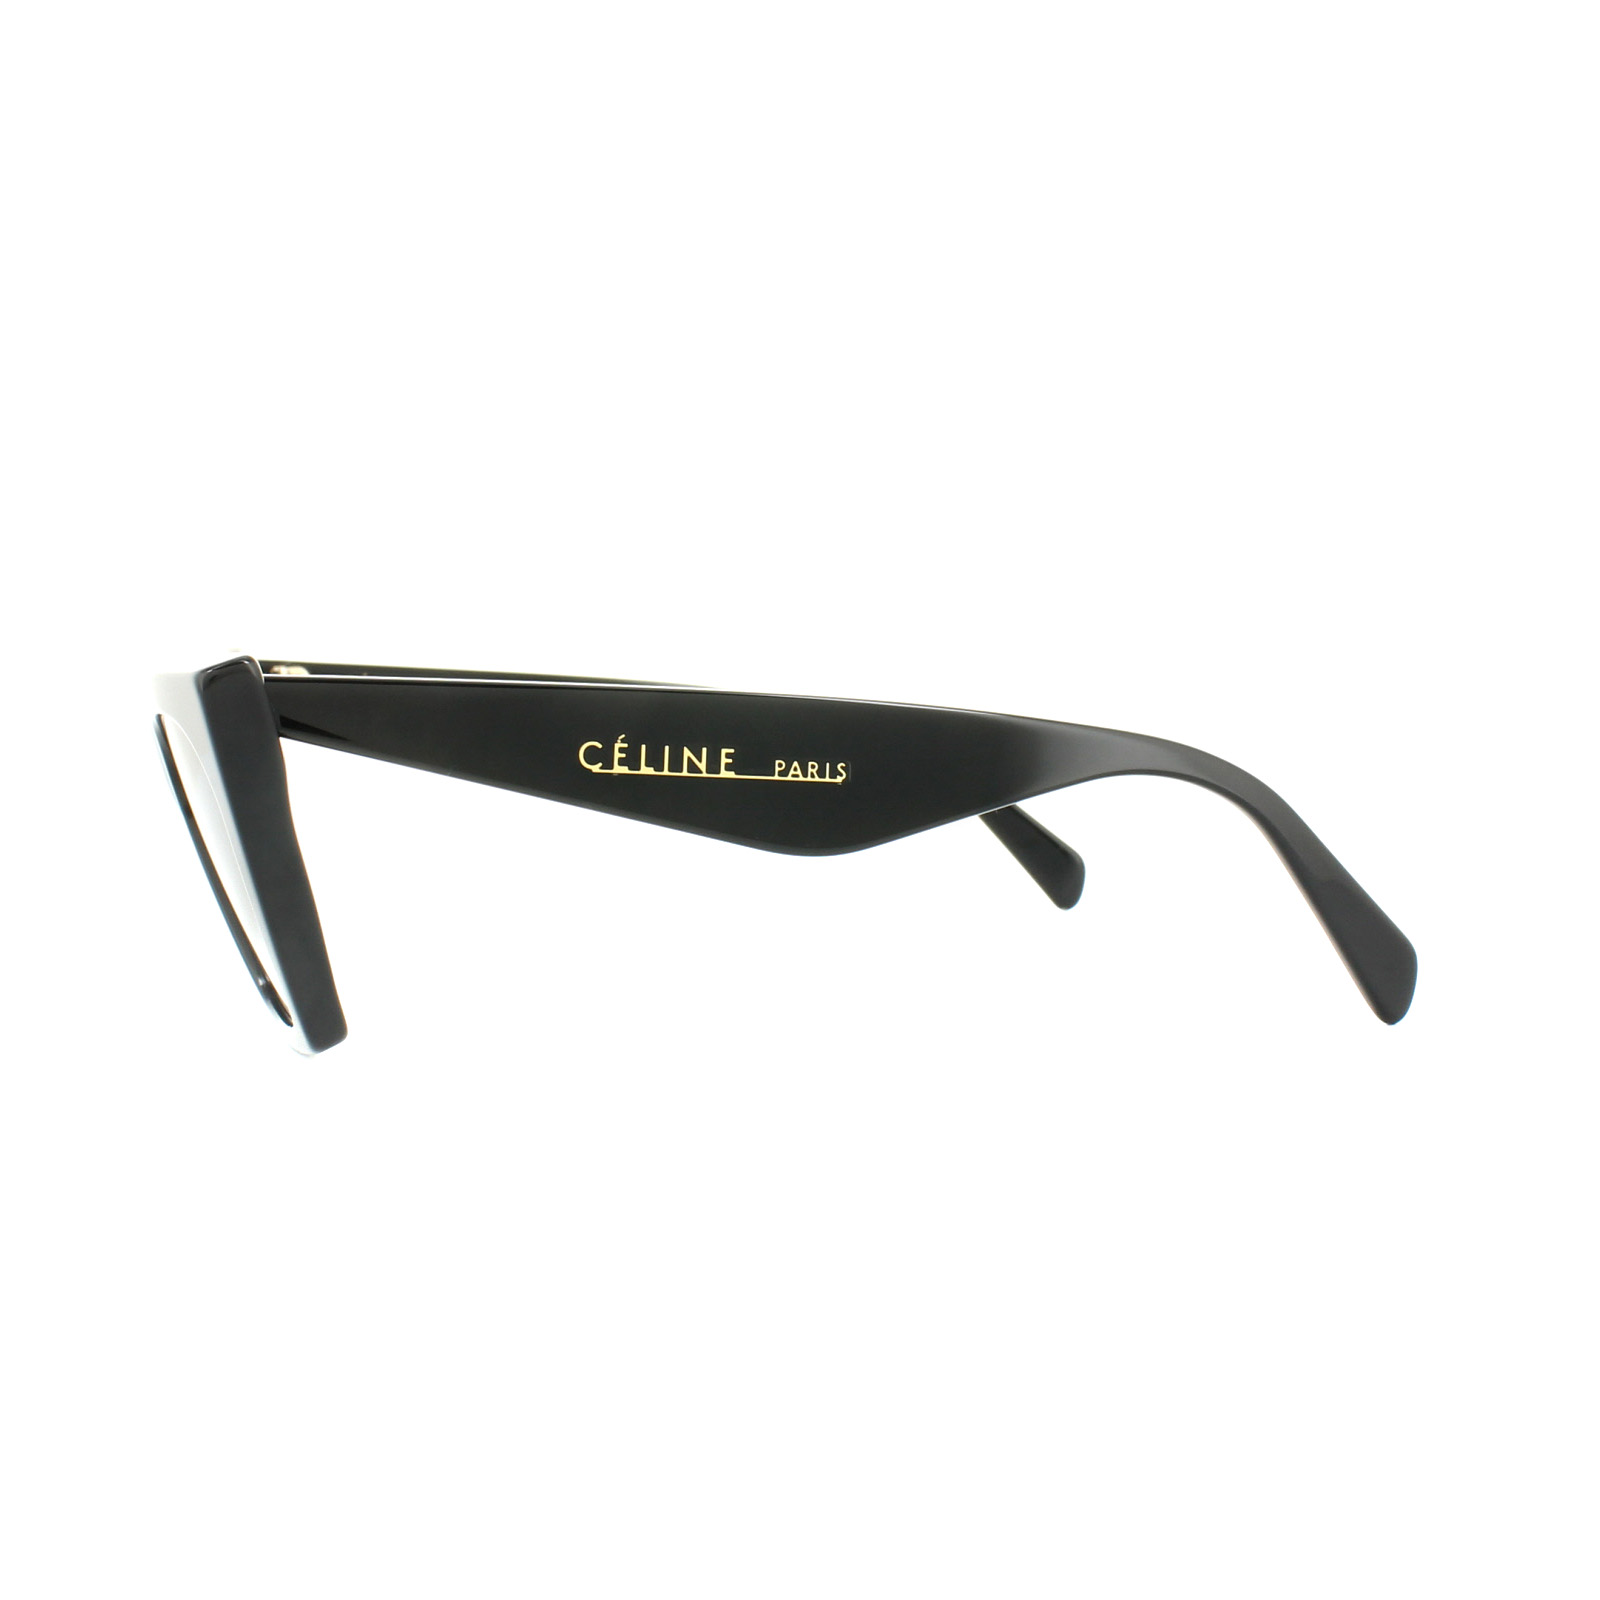 7c99afdf0c9 Celine Sunglasses 41468 S Edge 807 IR Black Grey Blue